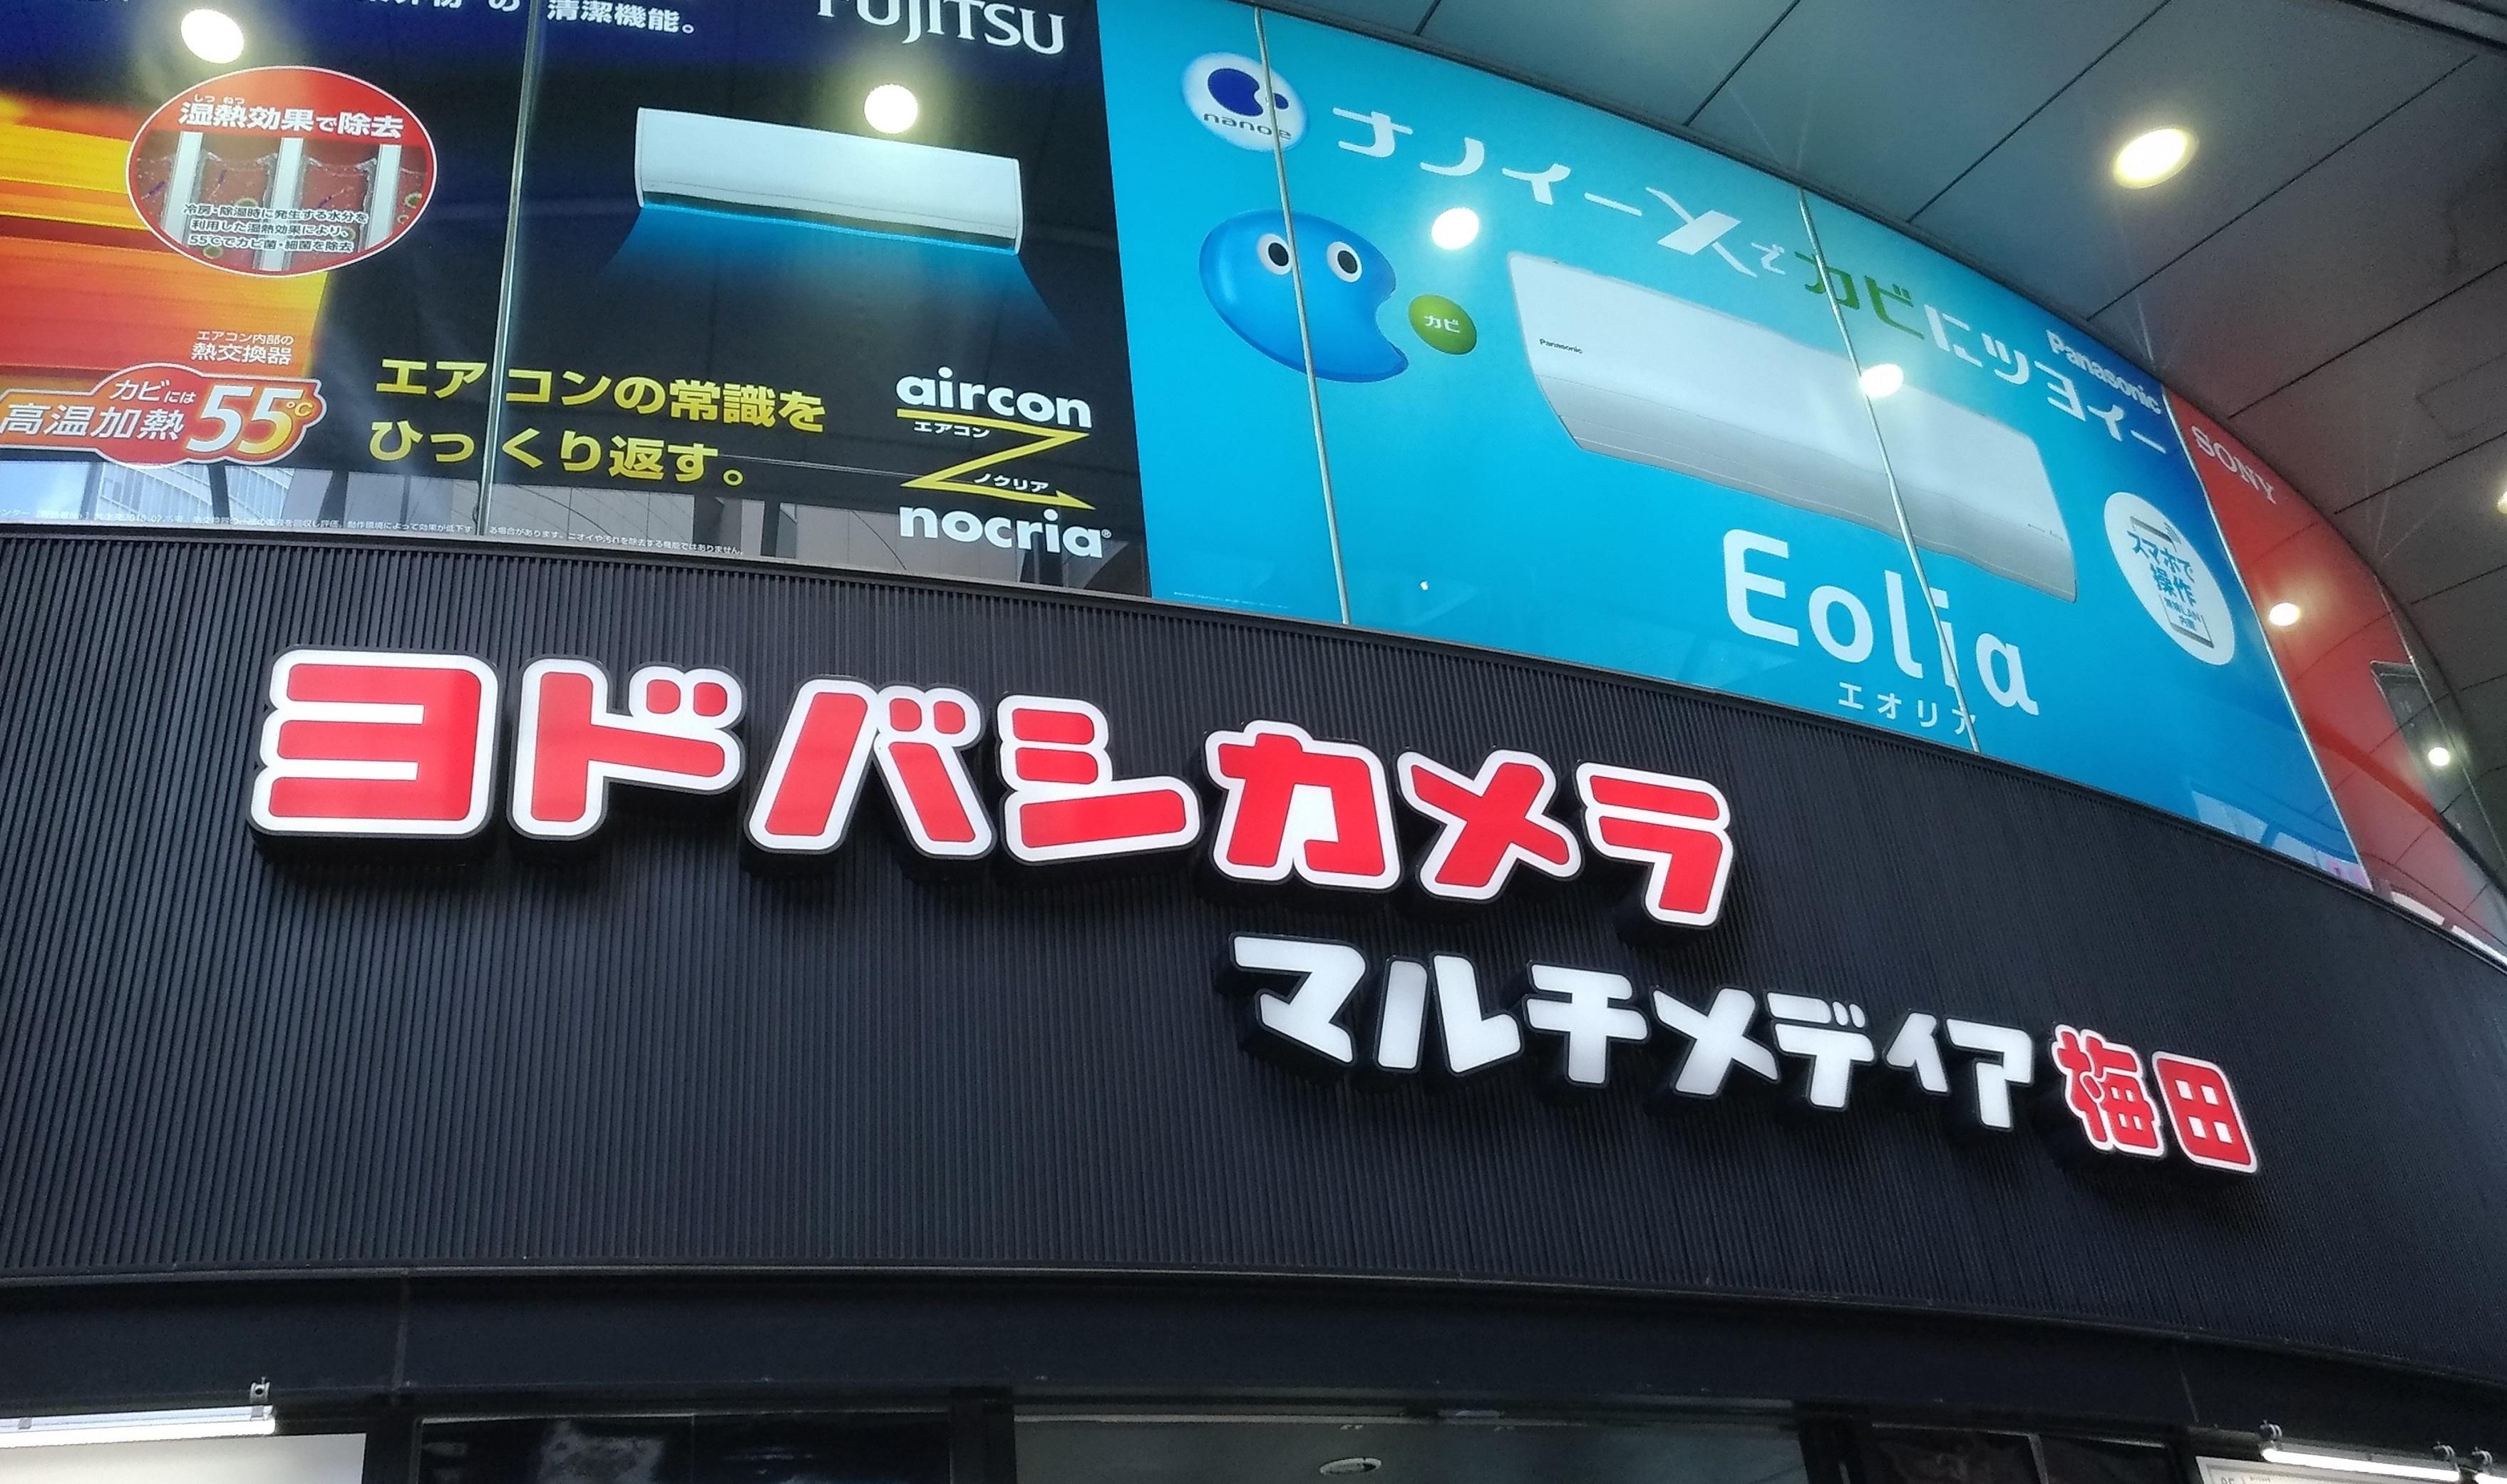 yodobashi_umeda_cycle_ryokin_.jpg